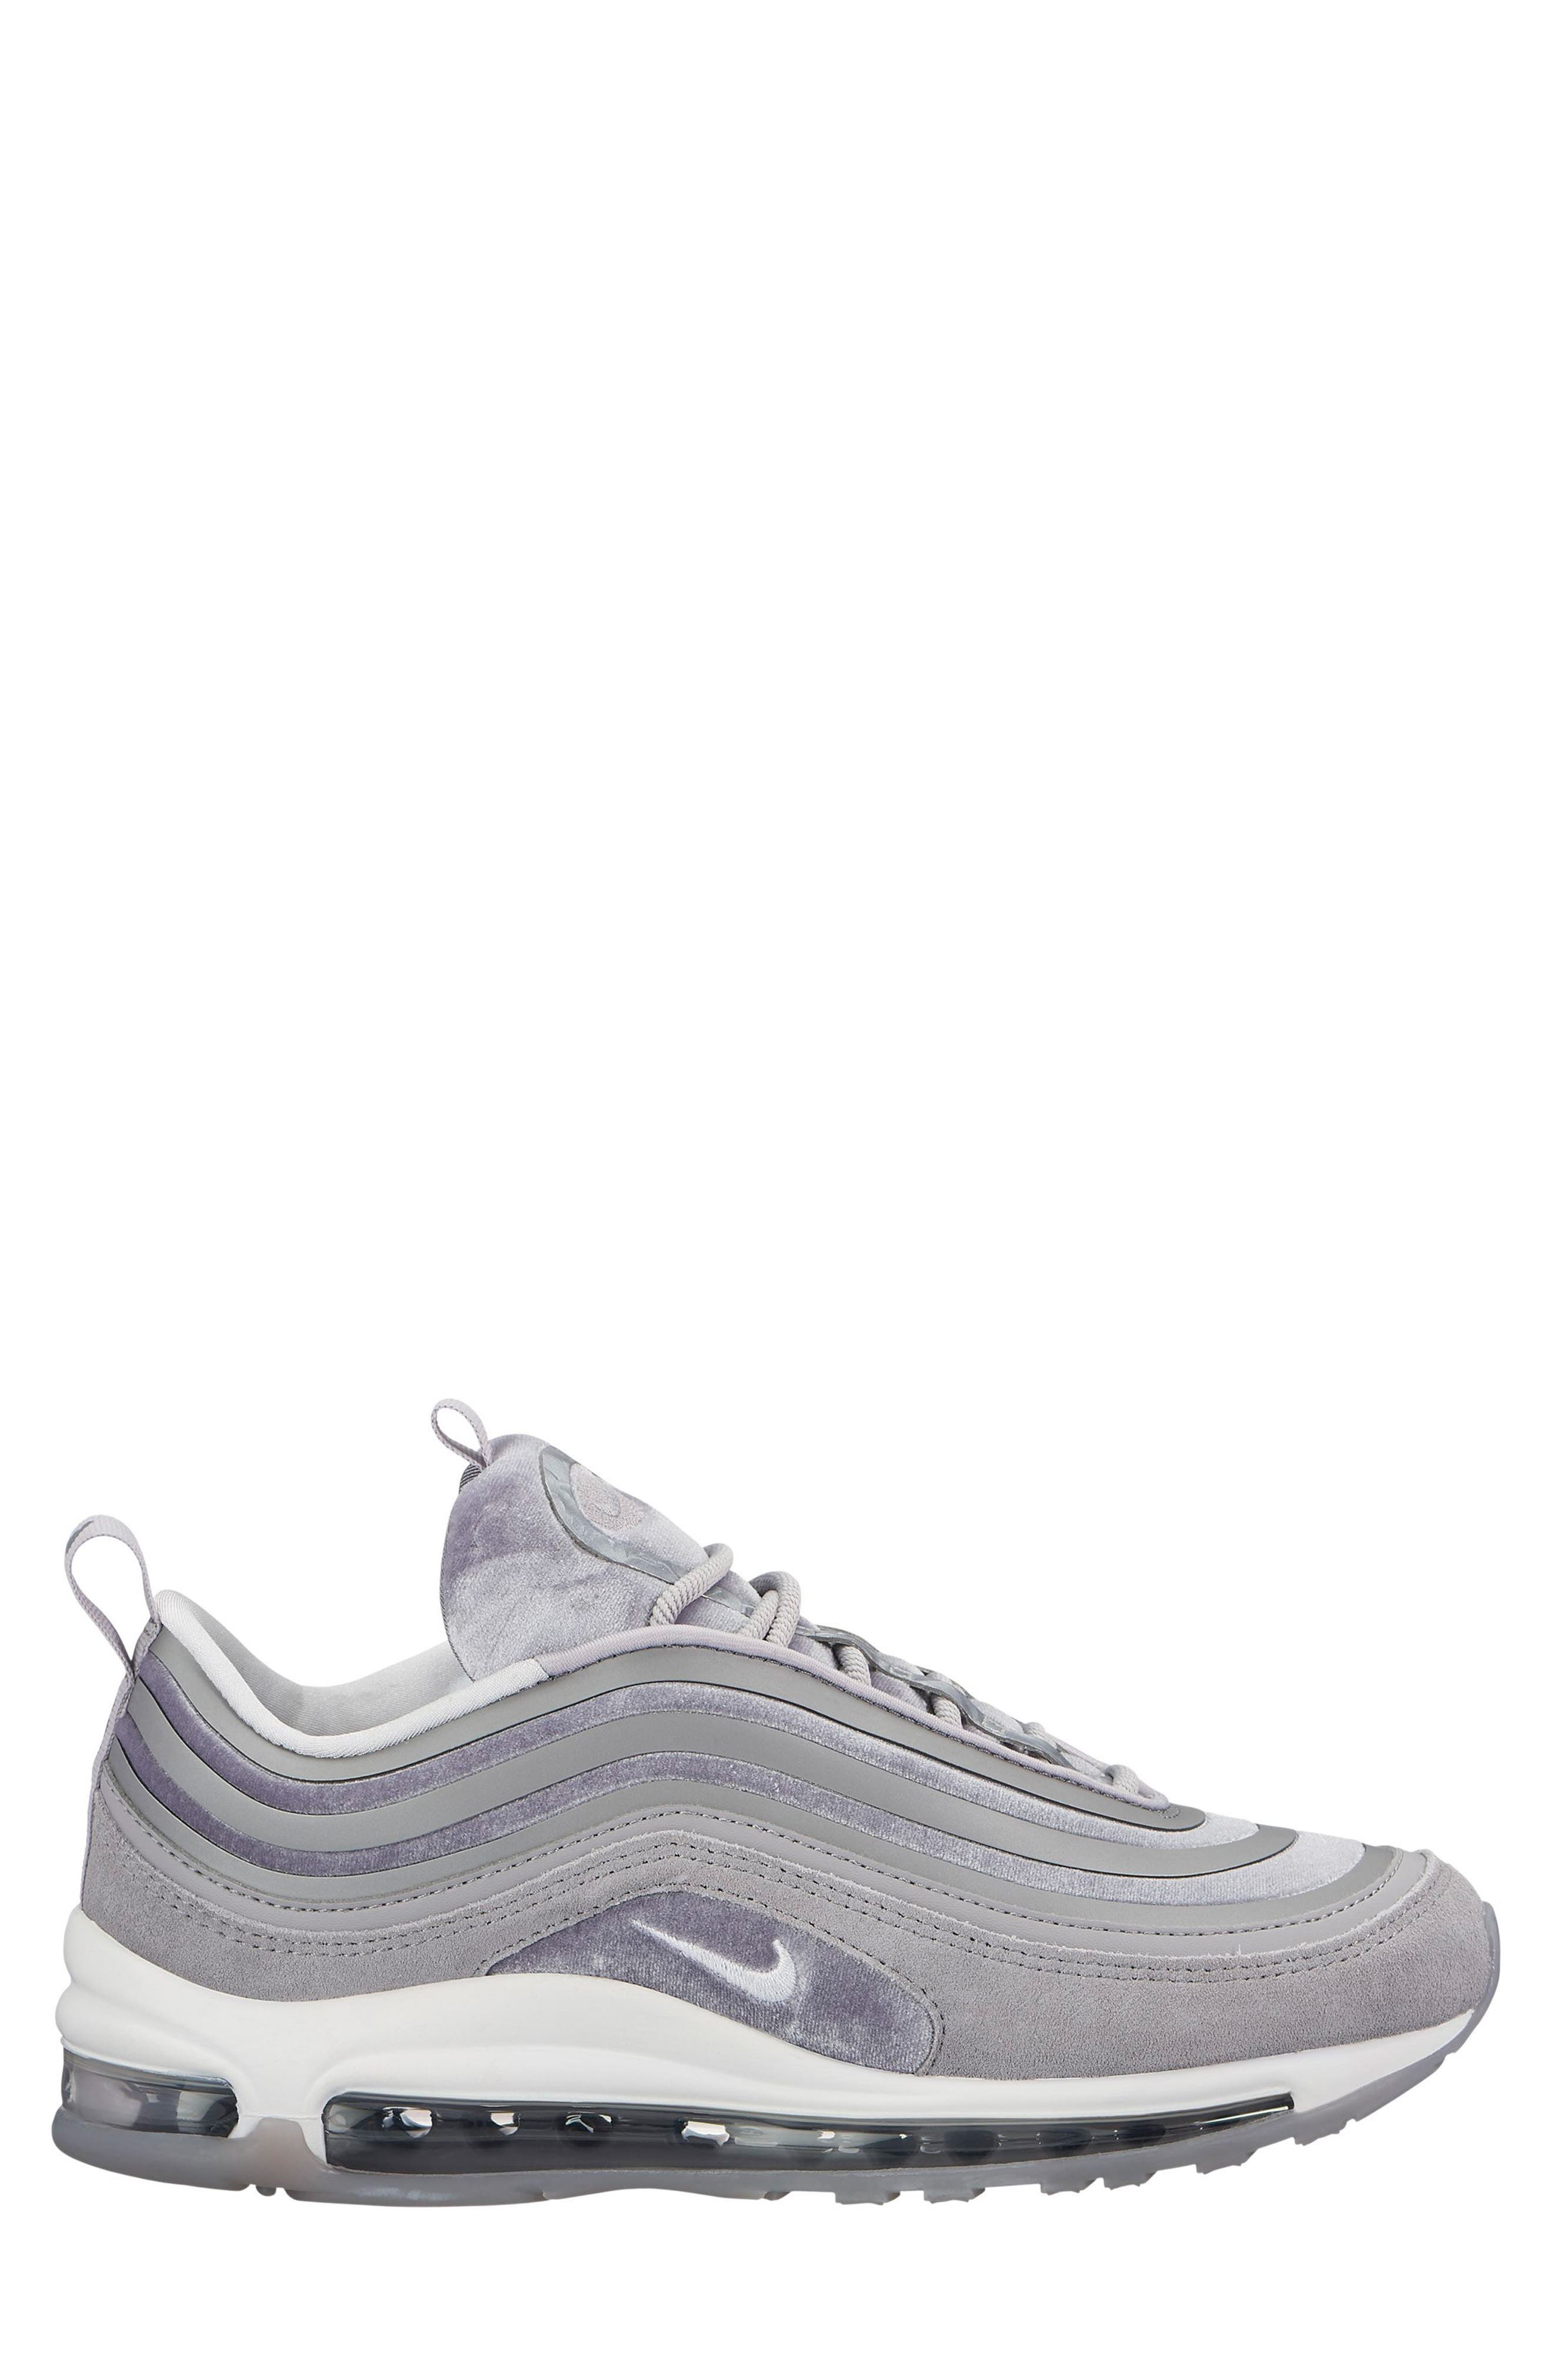 Air Max 97 Ultra '17 LX Sneaker,                         Main,                         color, 021